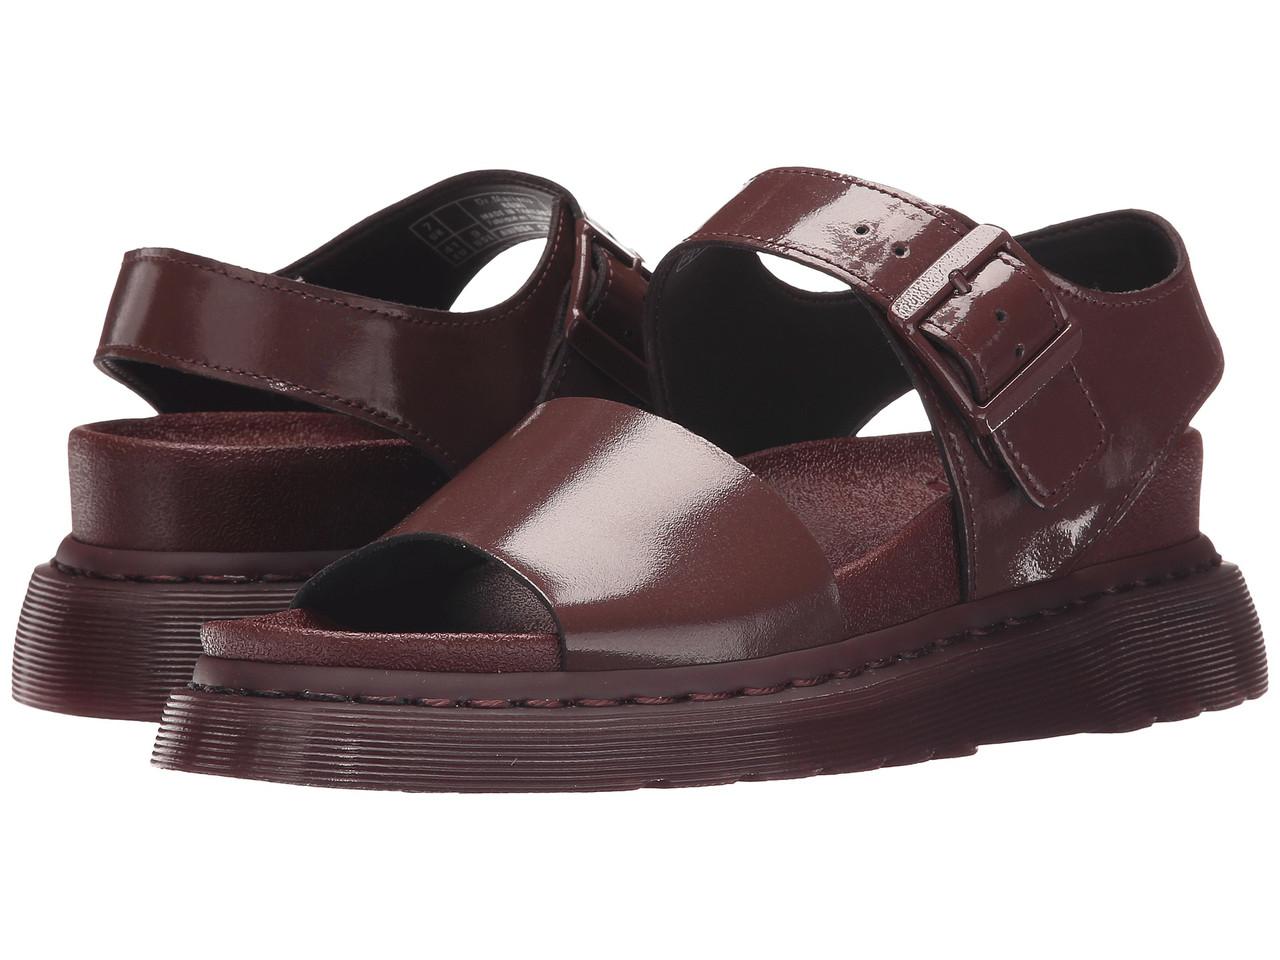 5f30218d8c34fb Стильні чоловічі босоніжки сандалі Dr. Martens Romi Y Strap Oxblood/Petrol  Fashion Sandals 43р